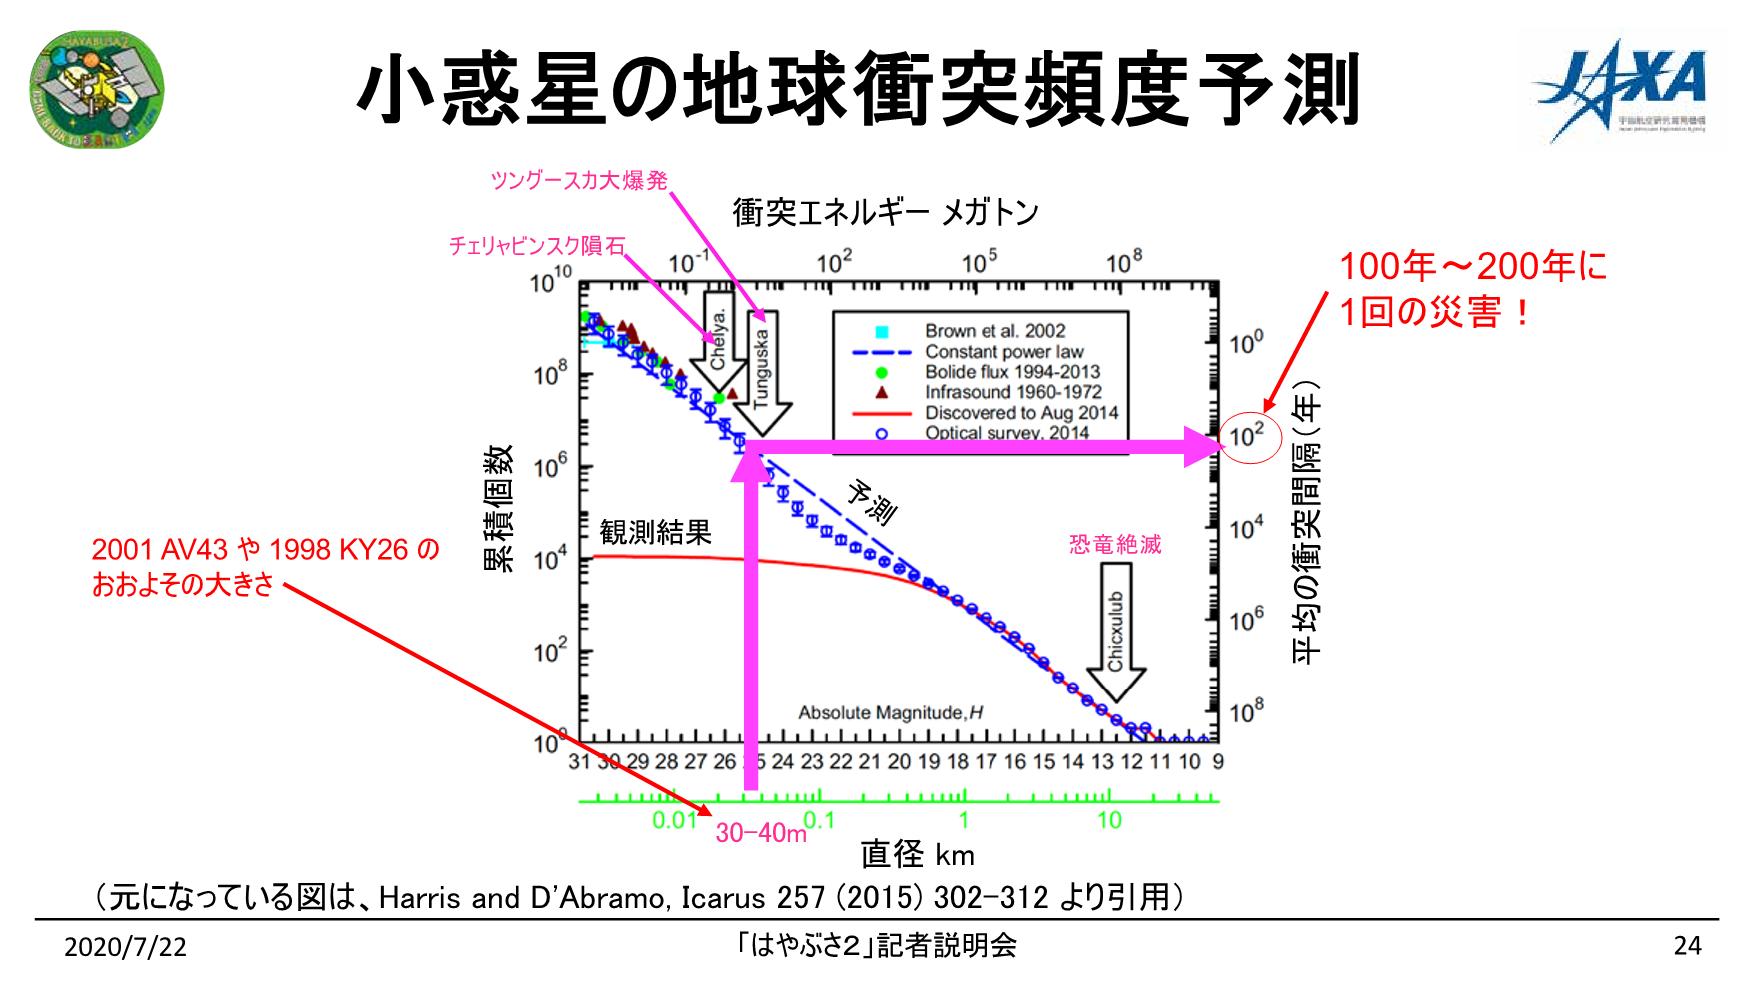 f:id:Imamura:20200722140830p:plain